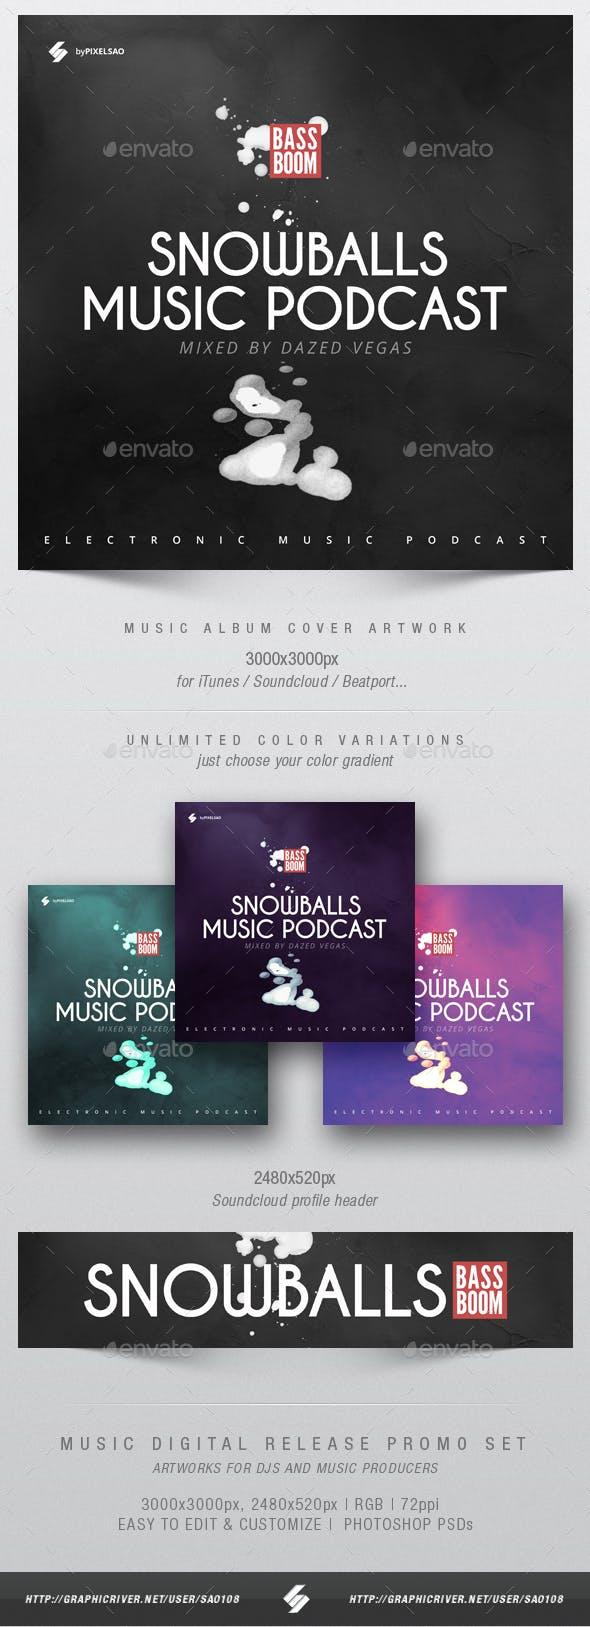 snowballs music album cover artwork template by sao108 graphicriver